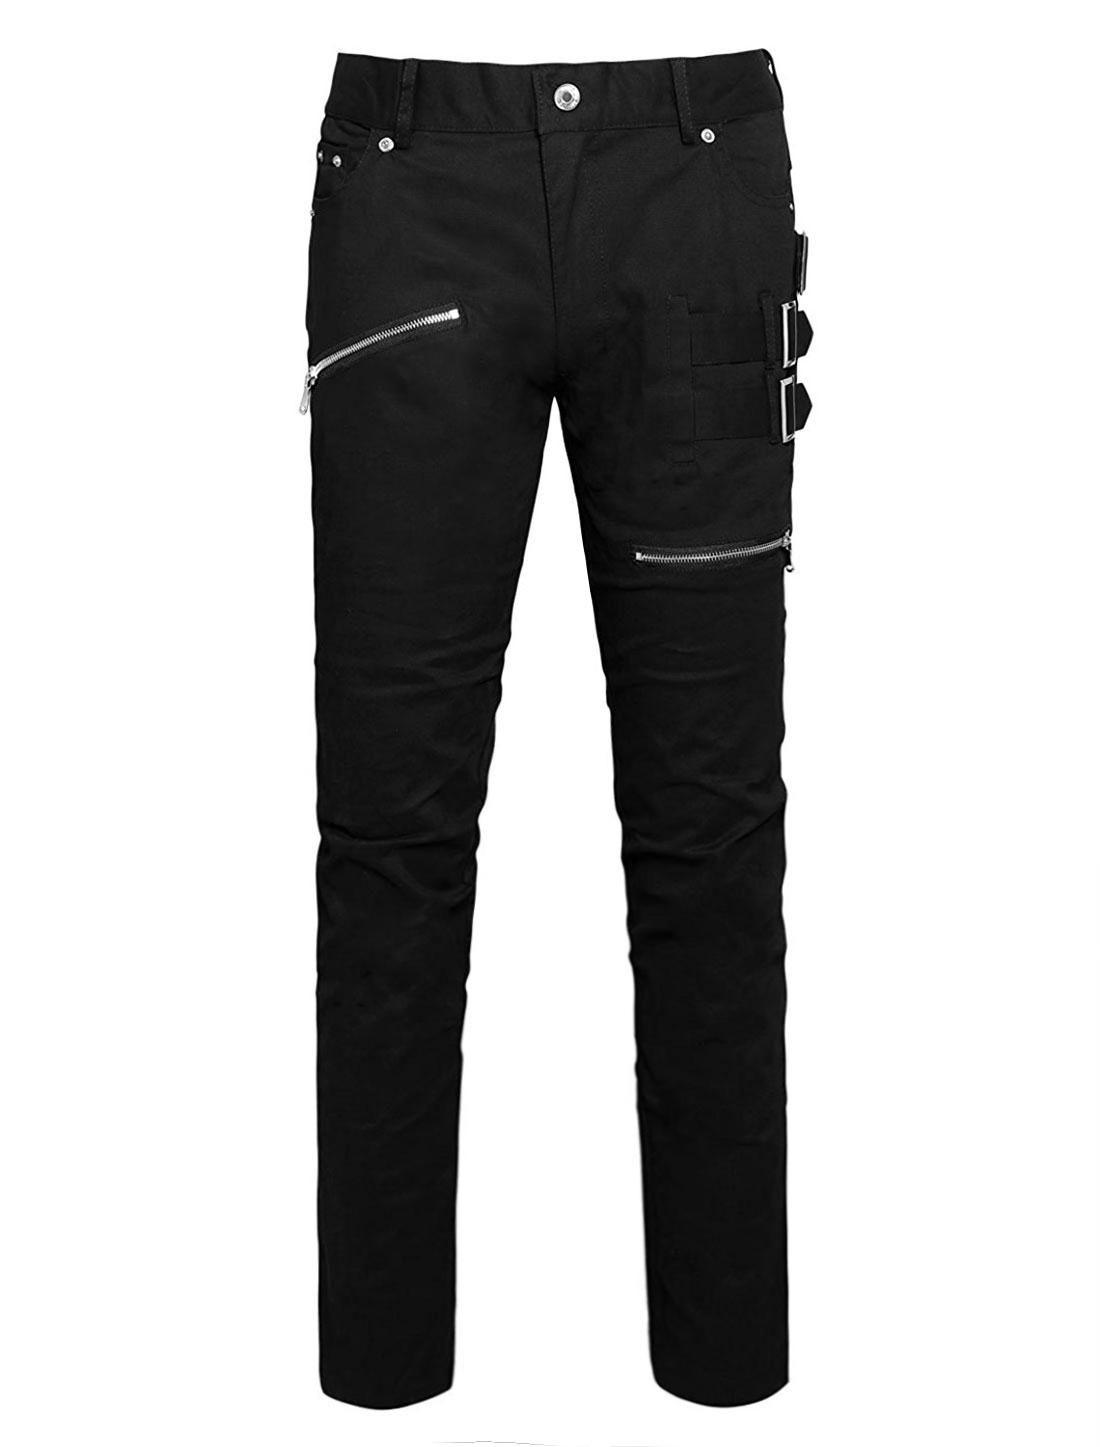 Man Zipper Buckle Embellished Button Closure Leisure Pants Black W32